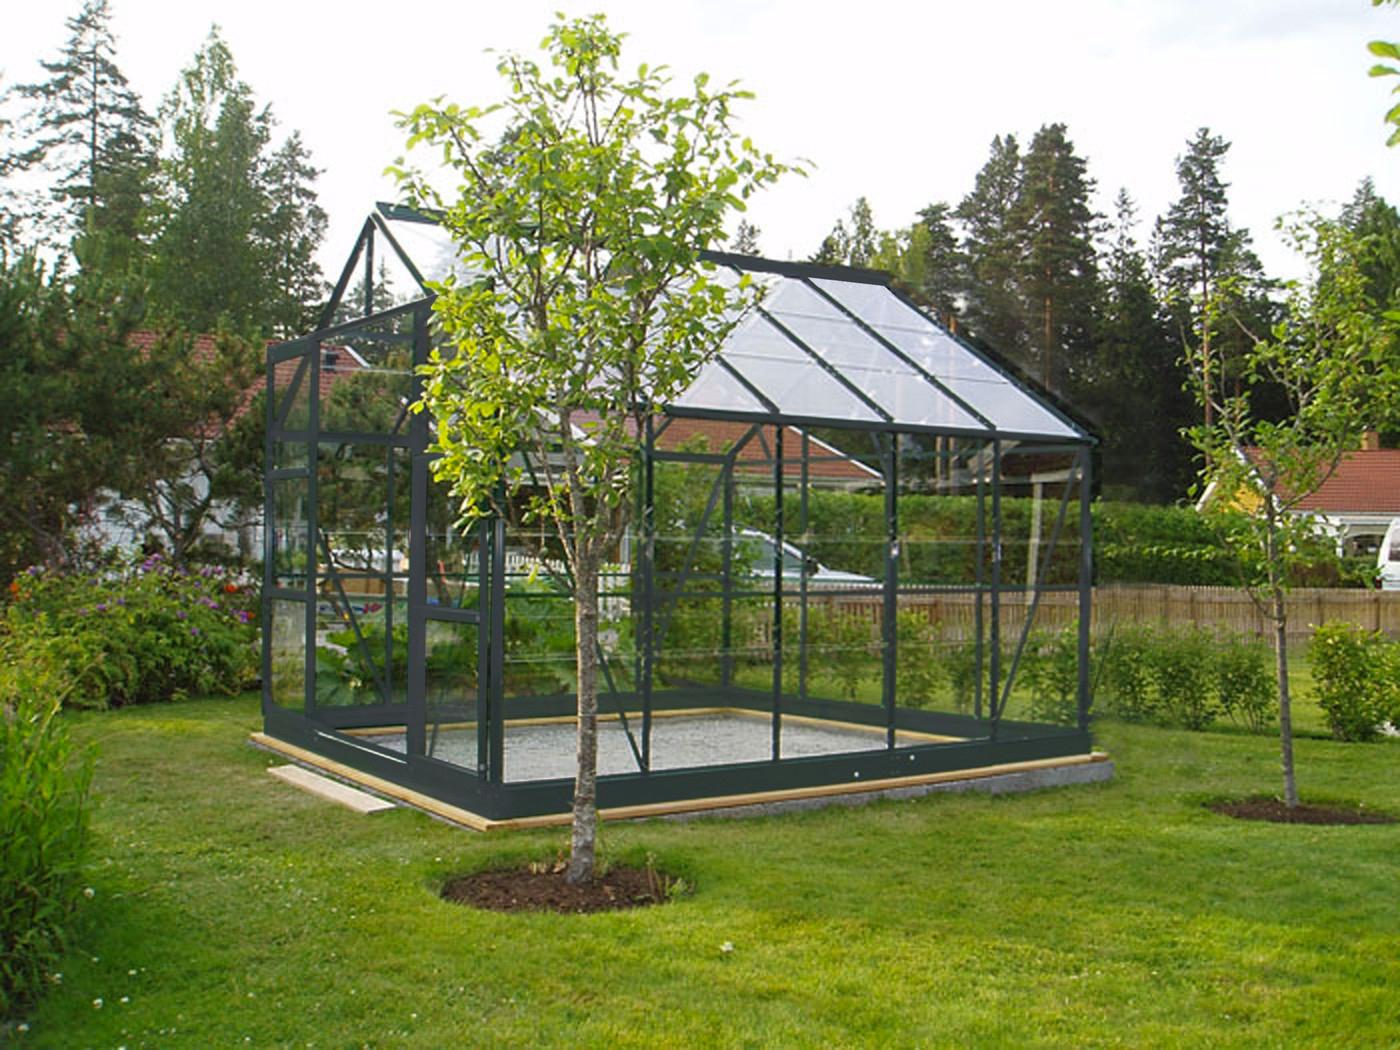 Serre De Jardin En Verre Trempé 7,42 M2 Gris Anthracite destiné Serres De Jardin En Verre